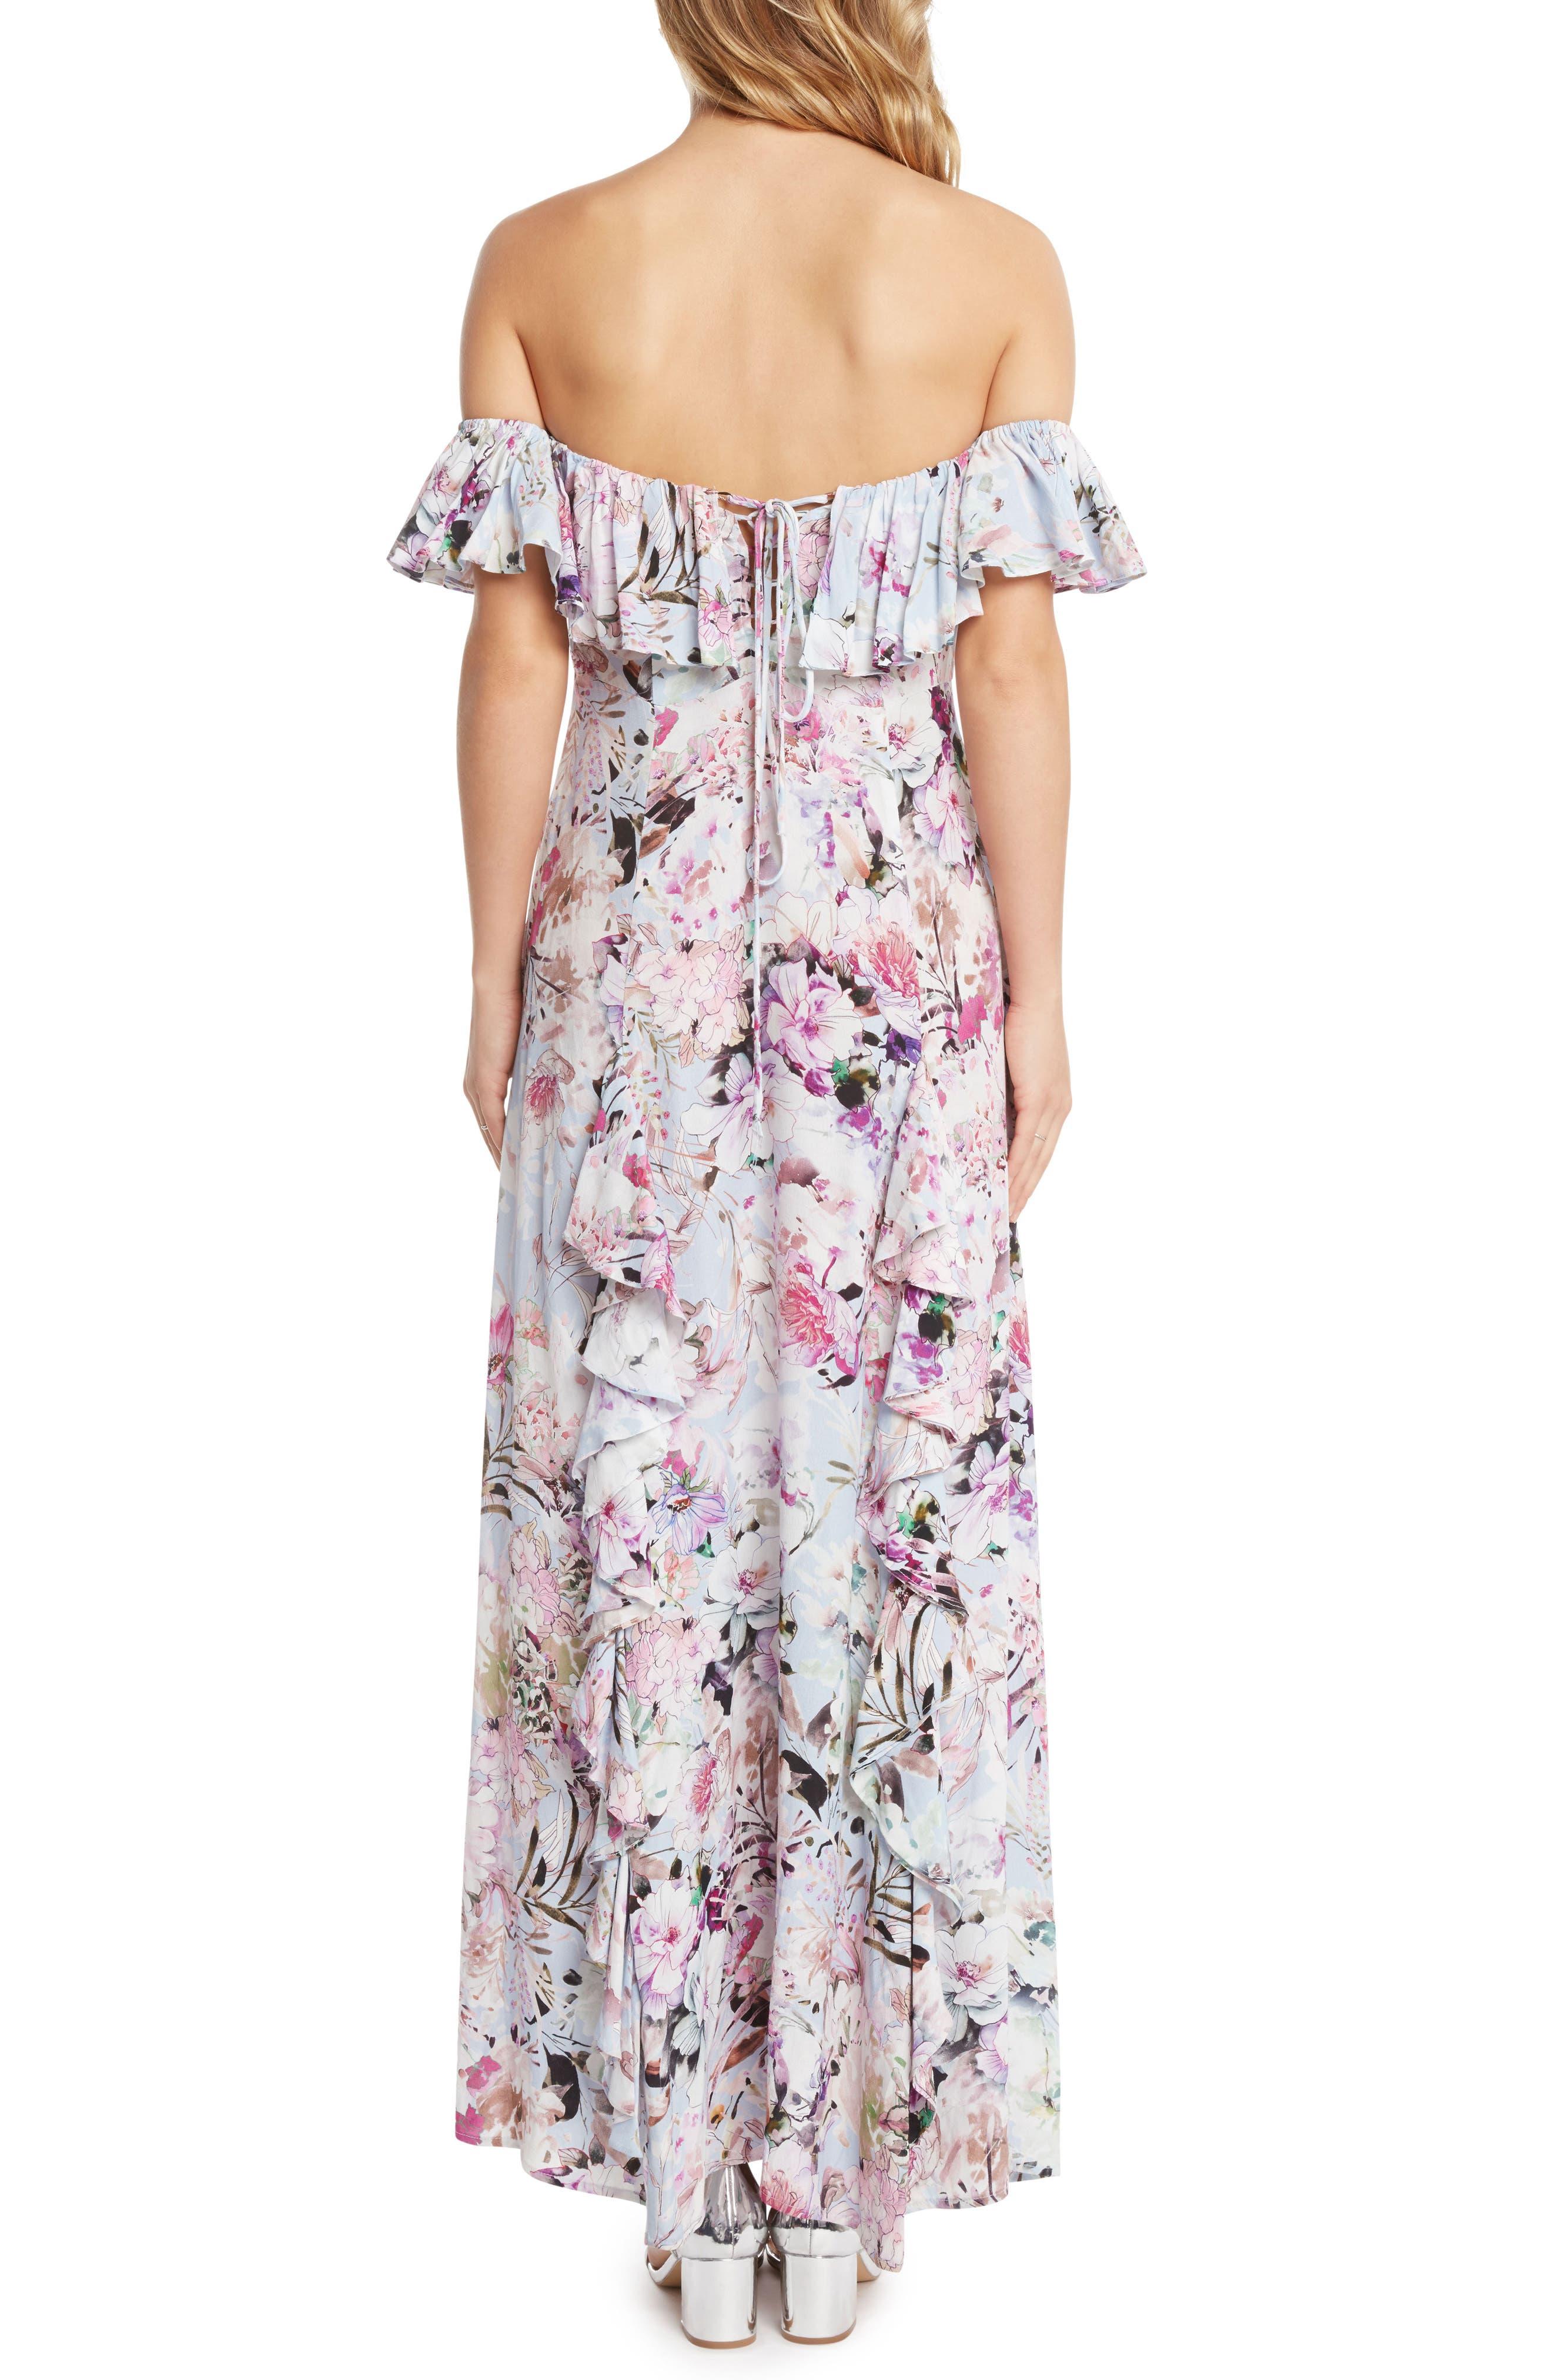 Floral Print Ruffle Maxi Dress,                             Alternate thumbnail 2, color,                             530